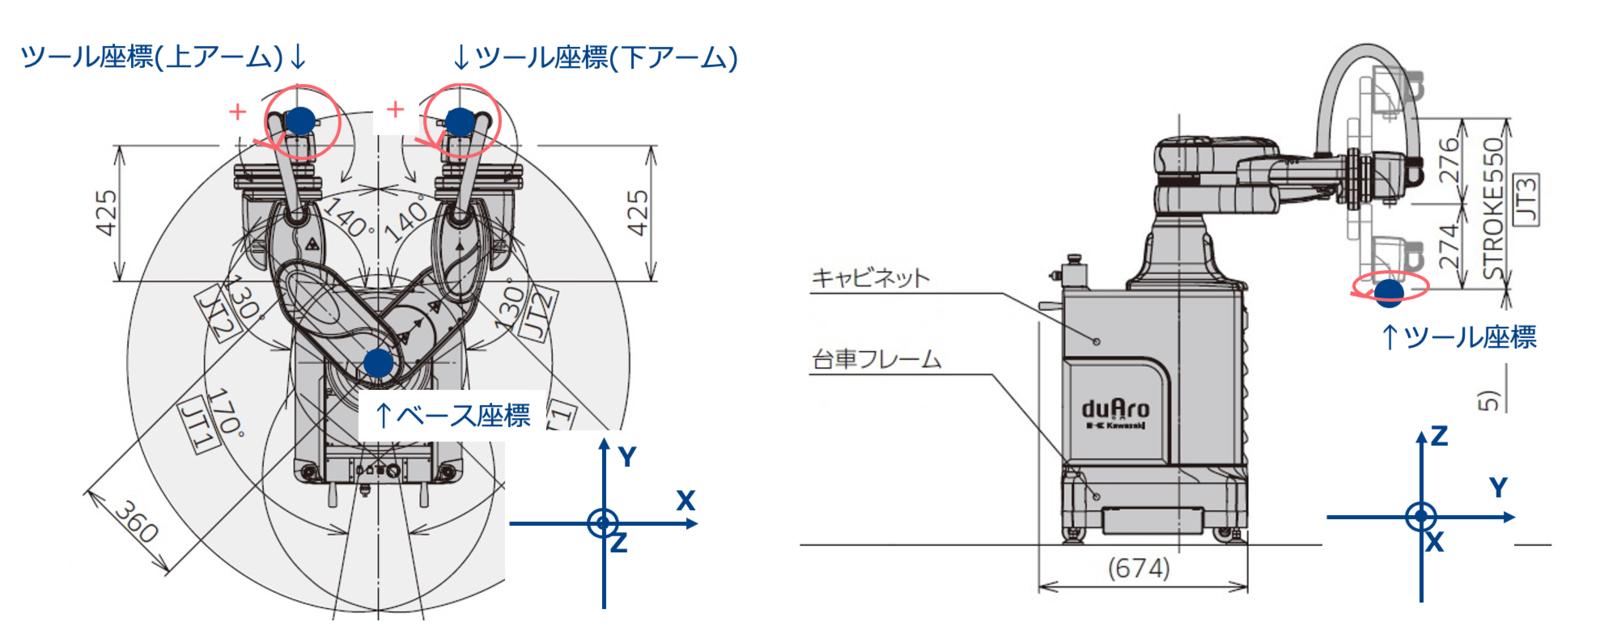 f:id:optim-tech:20210127205229p:plain